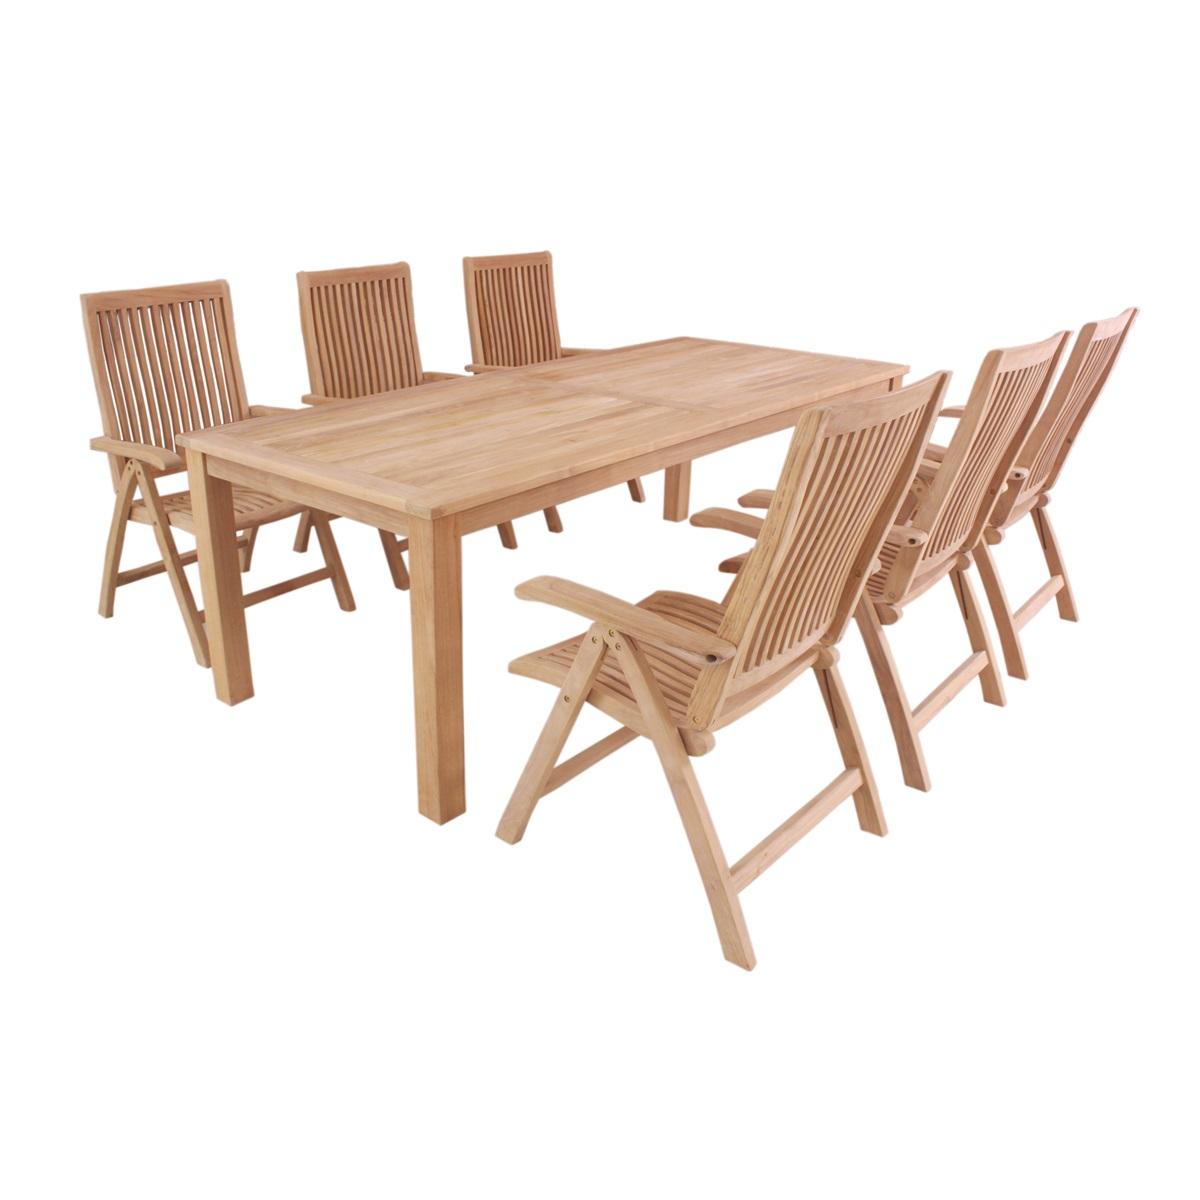 Garland Flores 6+, sestava nábytku z teaku (6x poloh. křeslo Aston, 1x stůl Oceana)